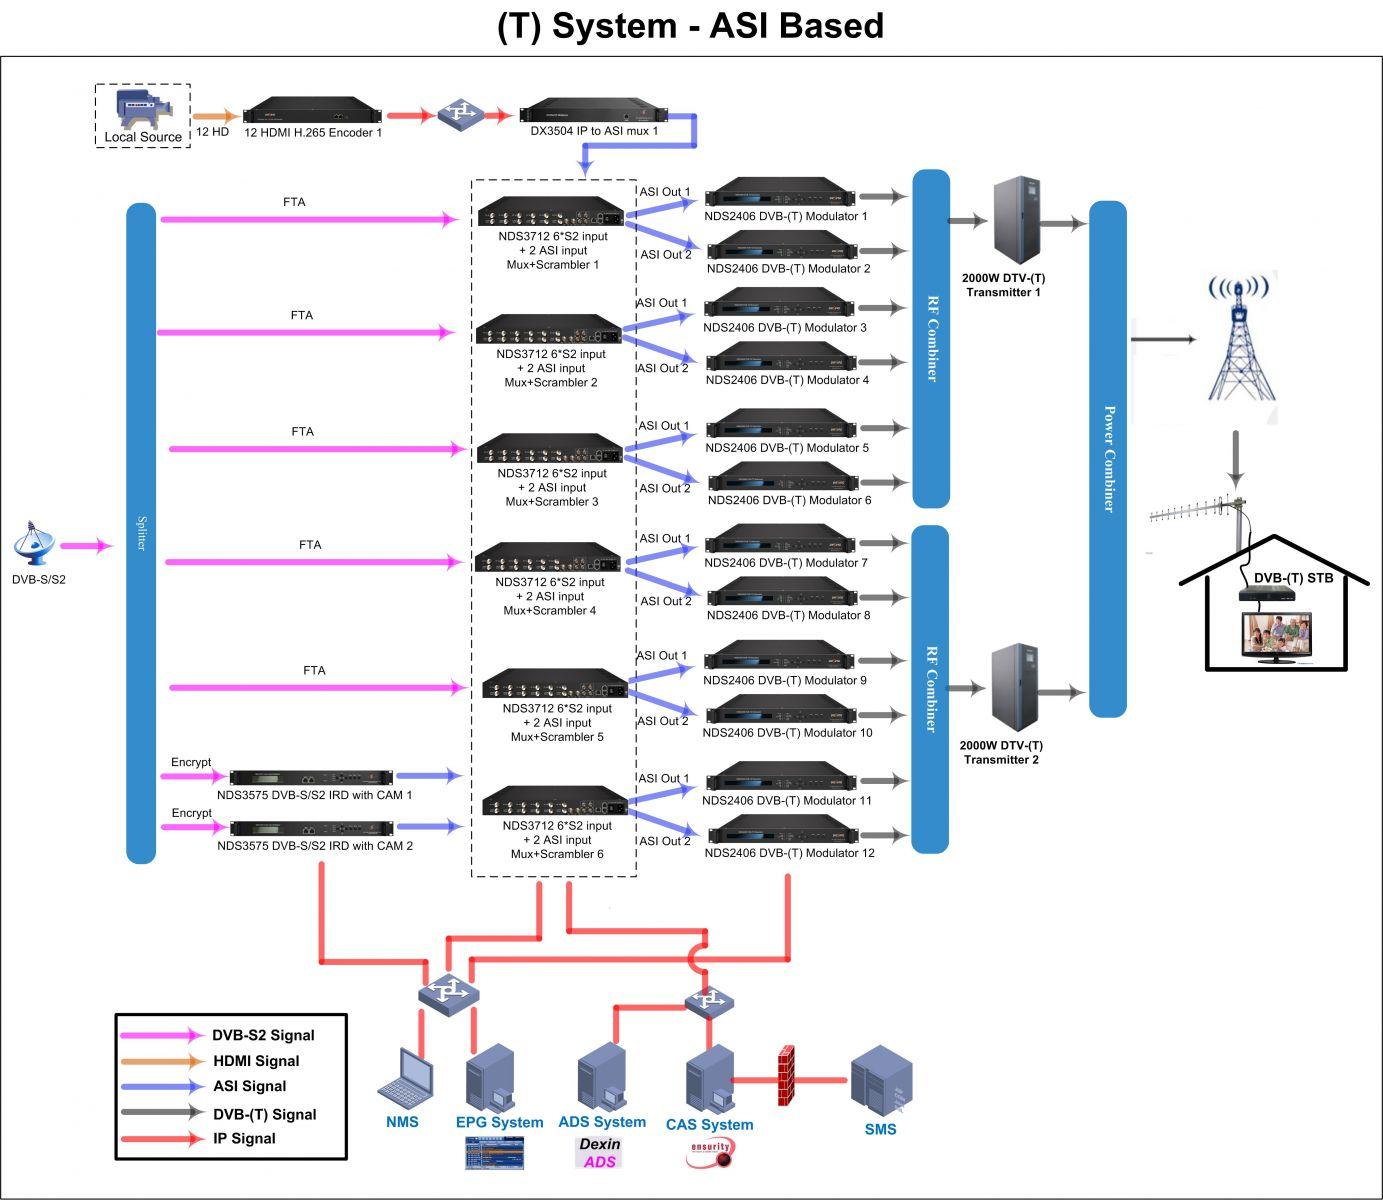 80 Programs Headend DVB-(T) Total Solution ASI